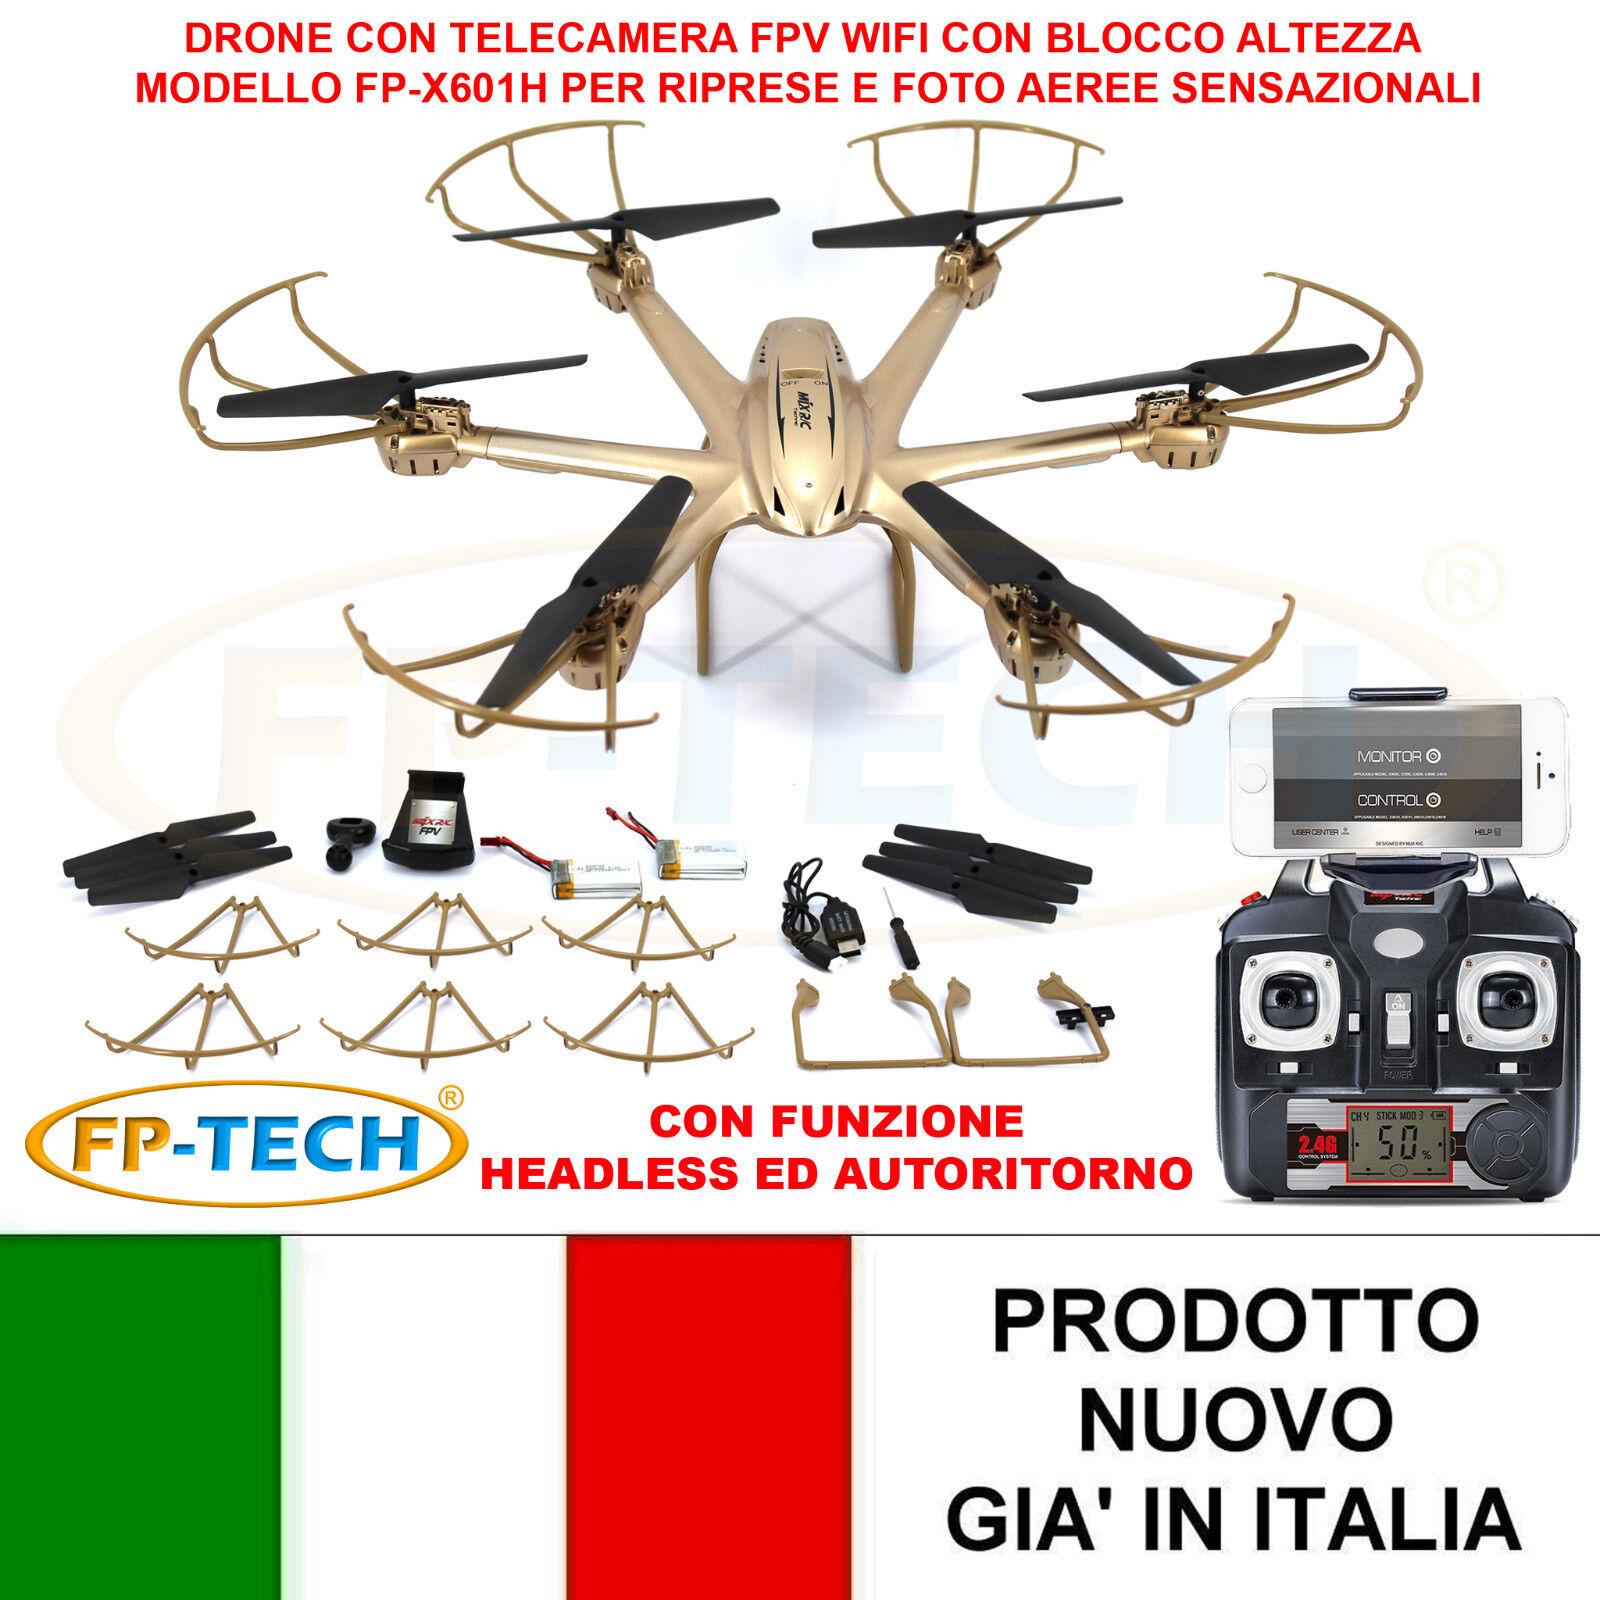 DRONE ESACOTTERO RADICOMANDATO HEADLESS WIFI FPV 3D CAMERA HD HD HD VIDEO FOT USB LED a3cc6c